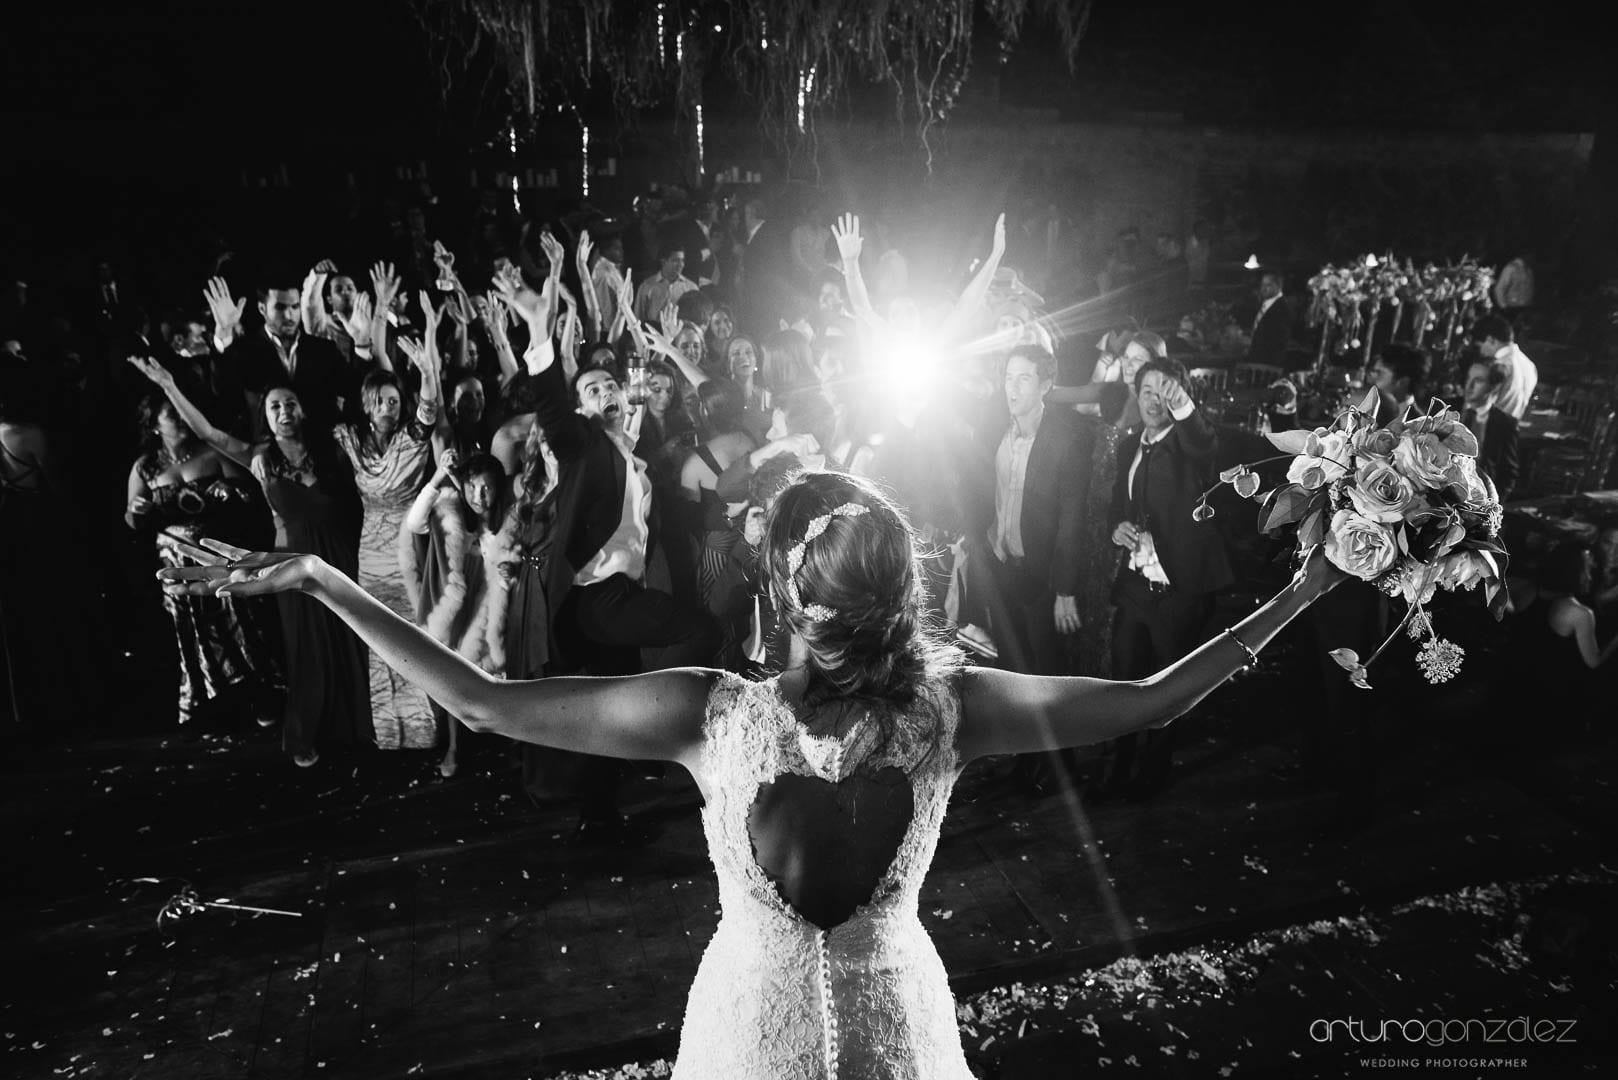 fotografo-de-bodas-en-guanajuato-145